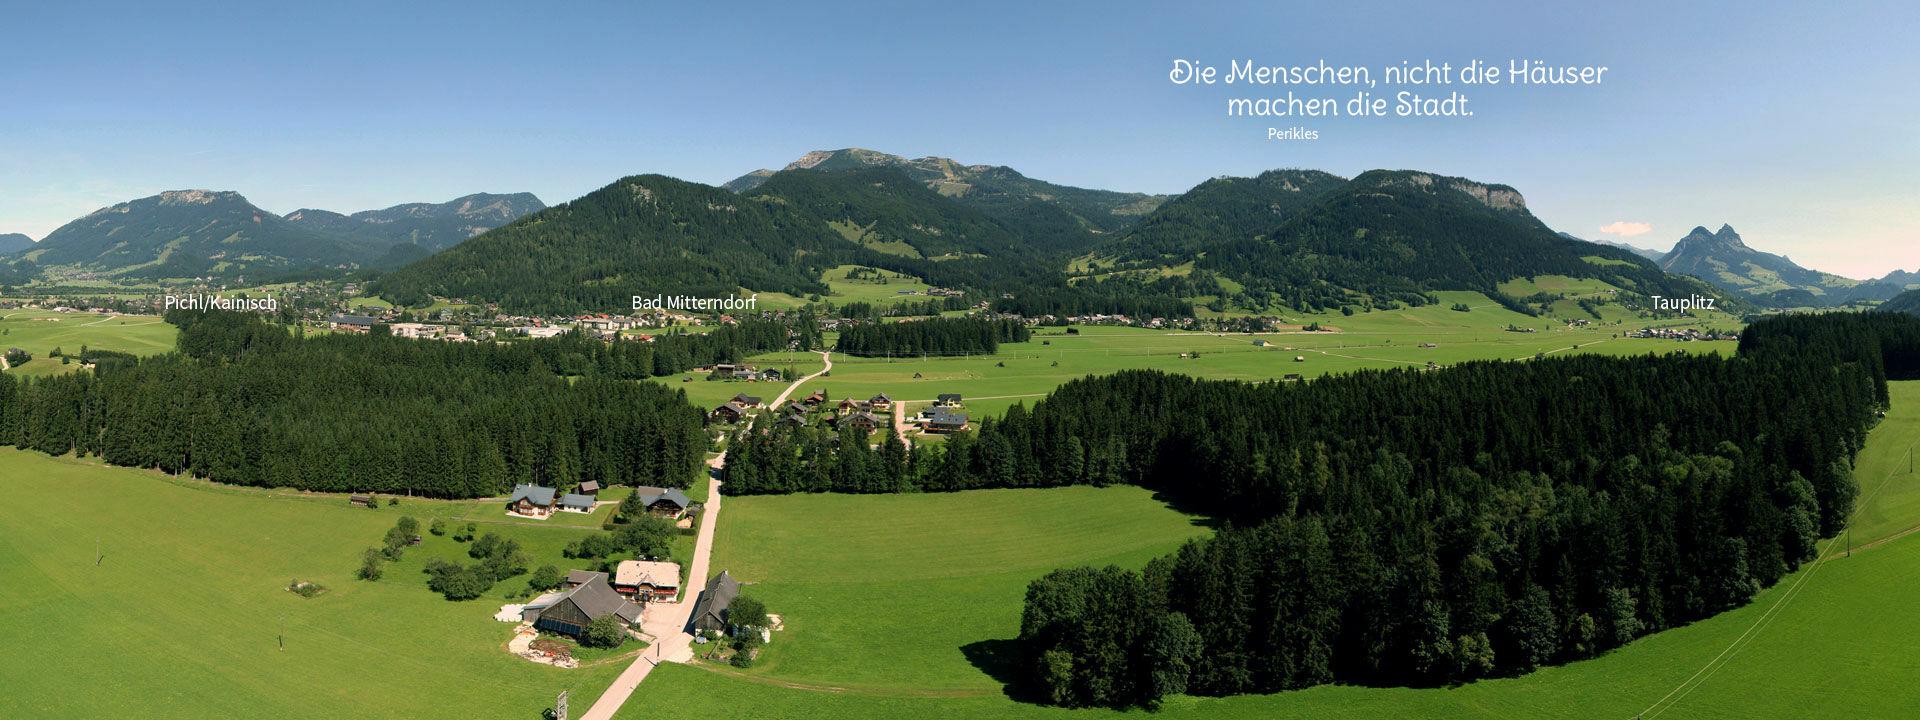 Bad Mitterndorf Events ab 08.06.2020 Party, Events - Szene1